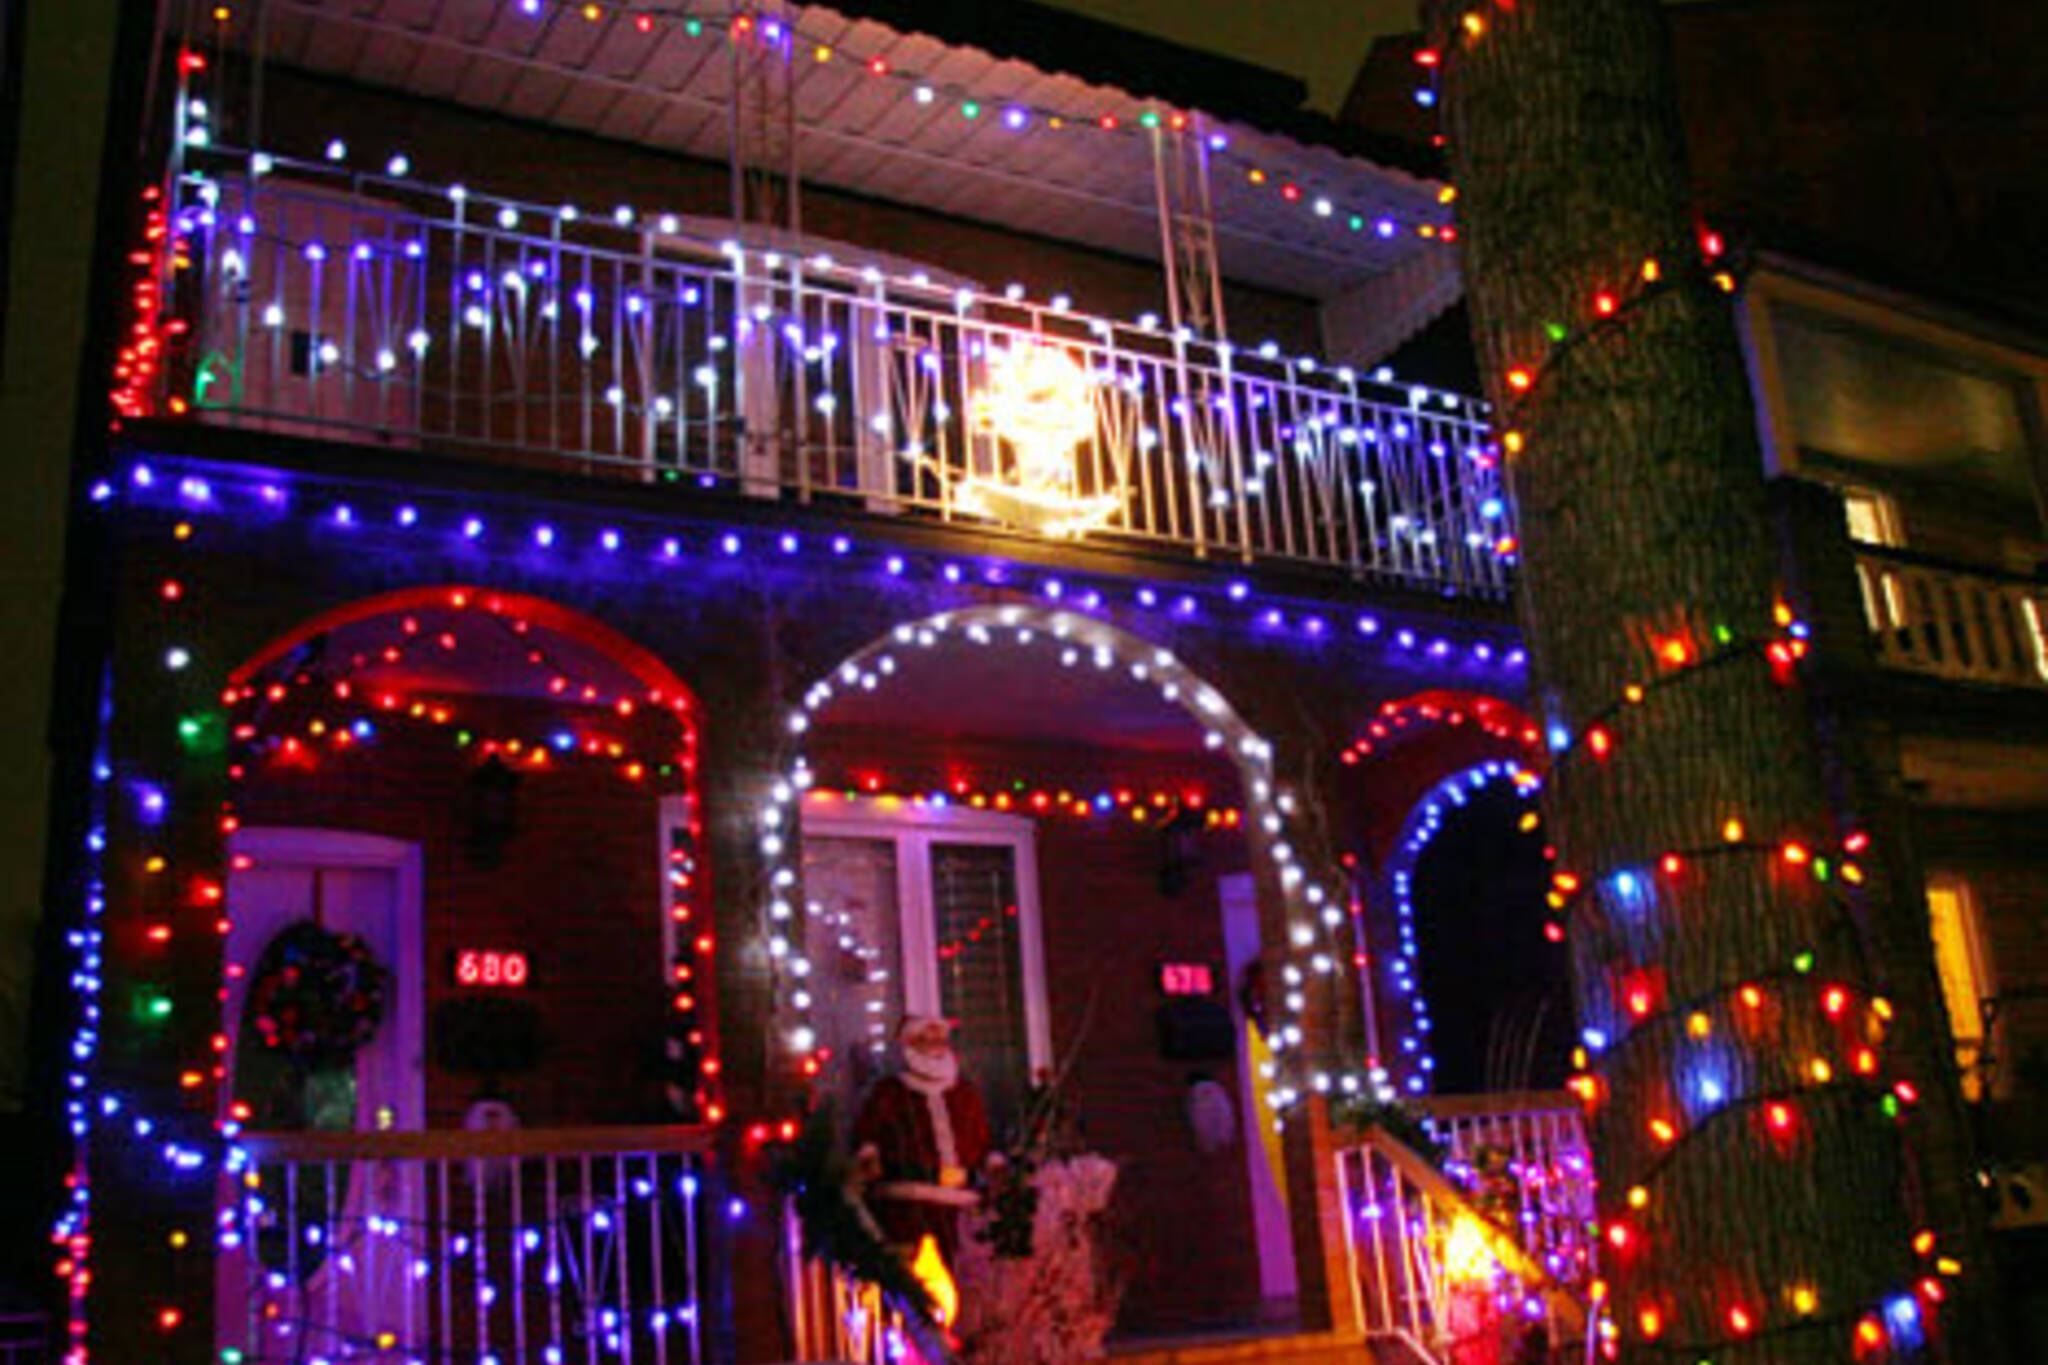 20061213-glowTO-adel1.jpg